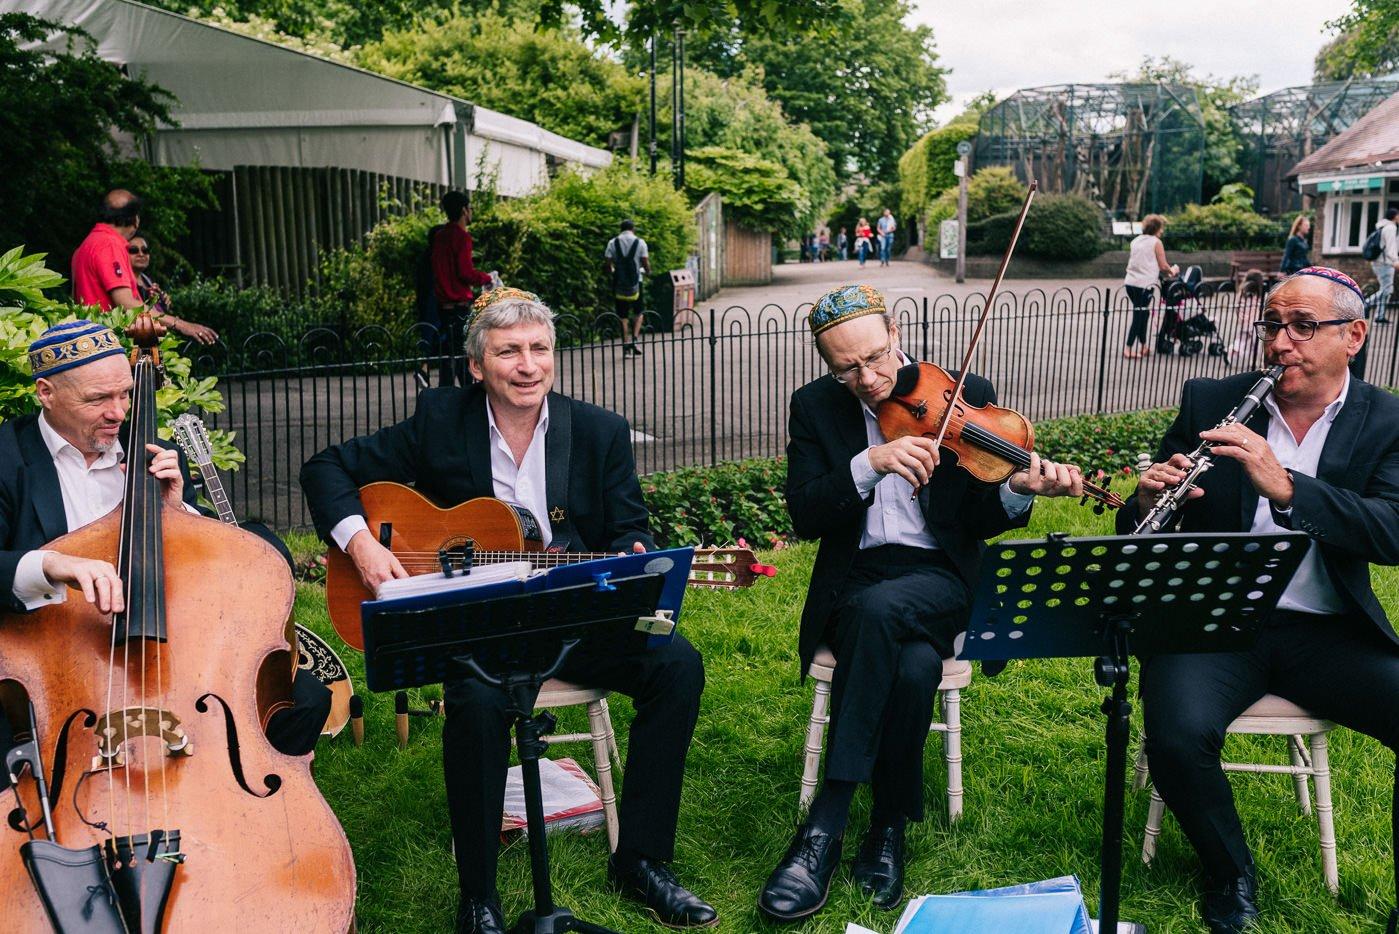 jewish wedding band london zoo wedding photographer